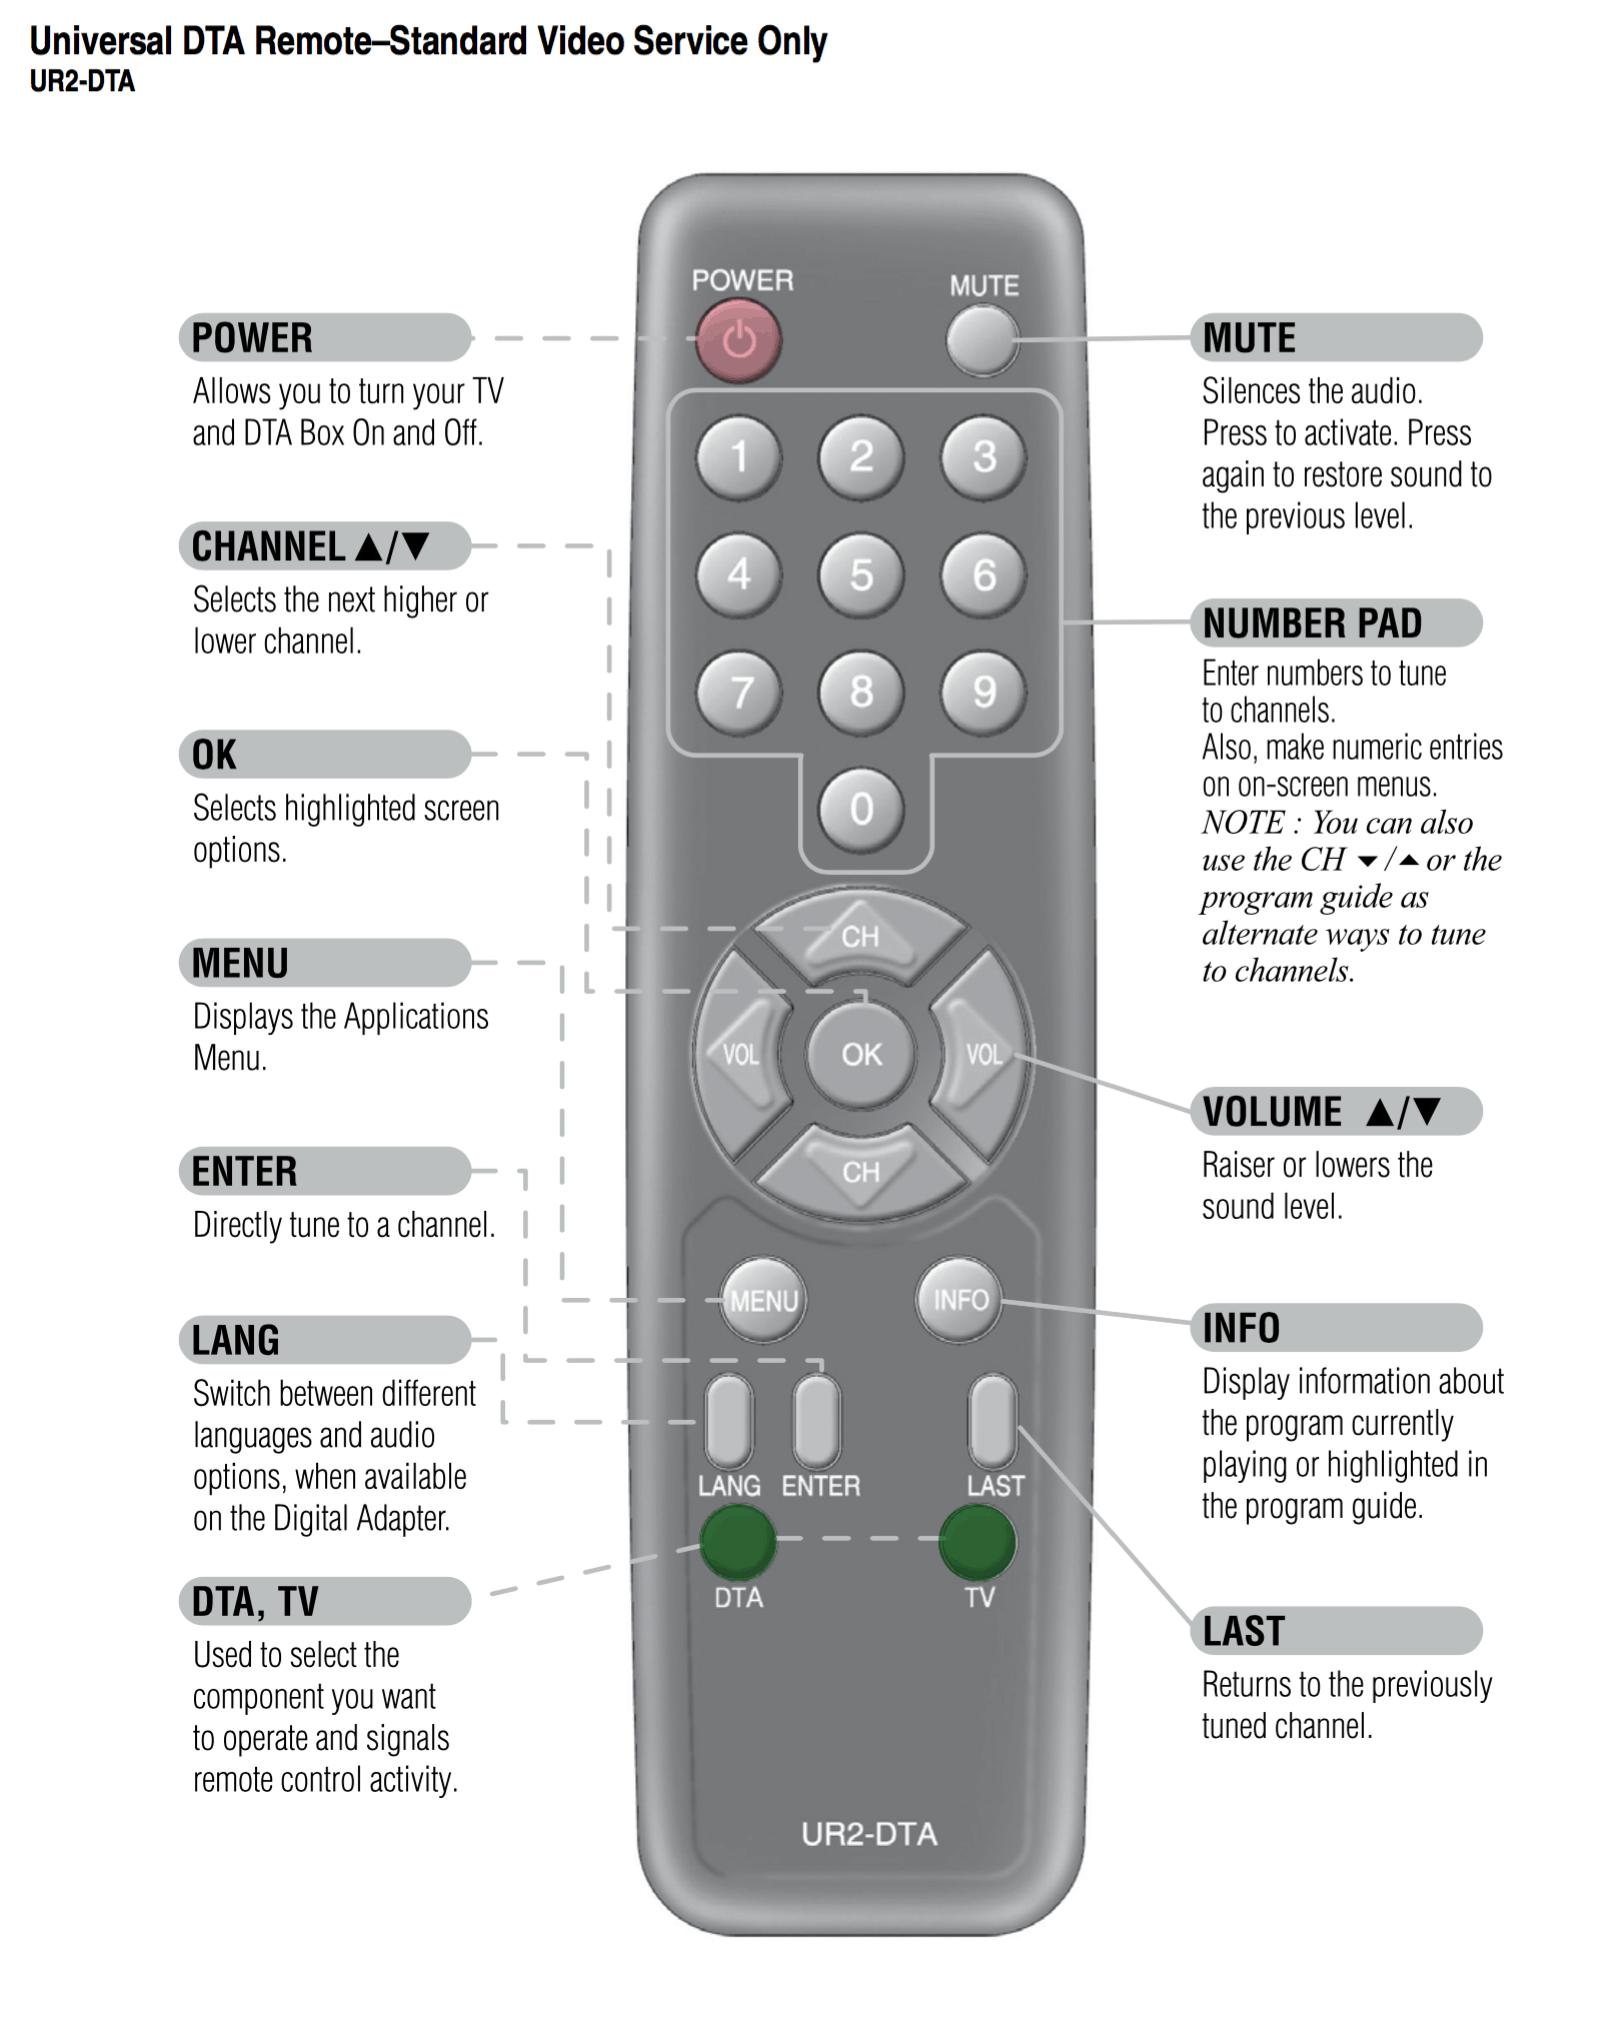 Universal DTA Remote